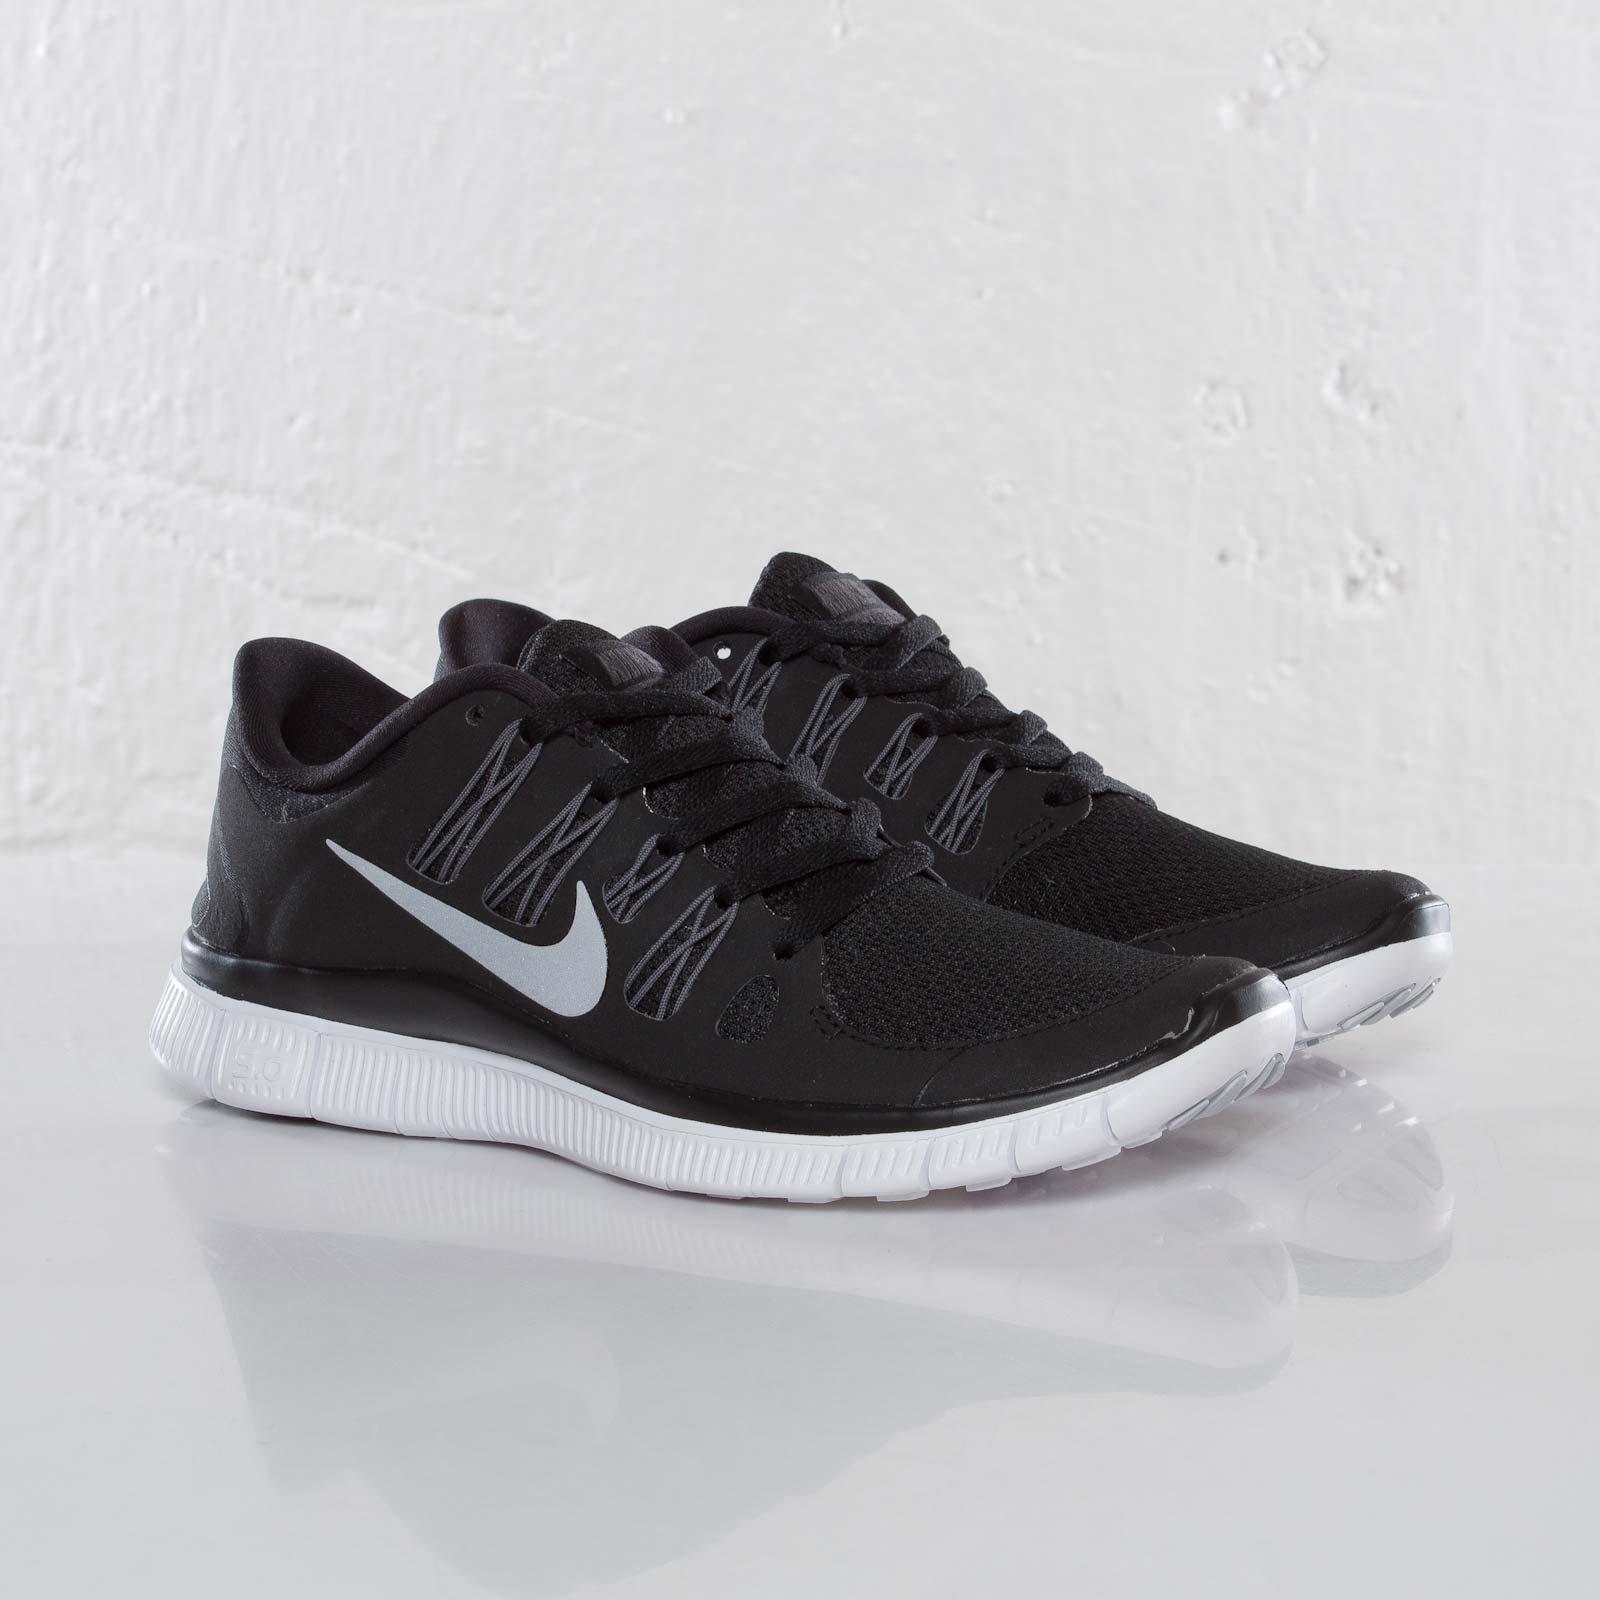 Details zu Women's Nike Free 5.0+ Black Metallic Silver Dark Grey White 580591 002